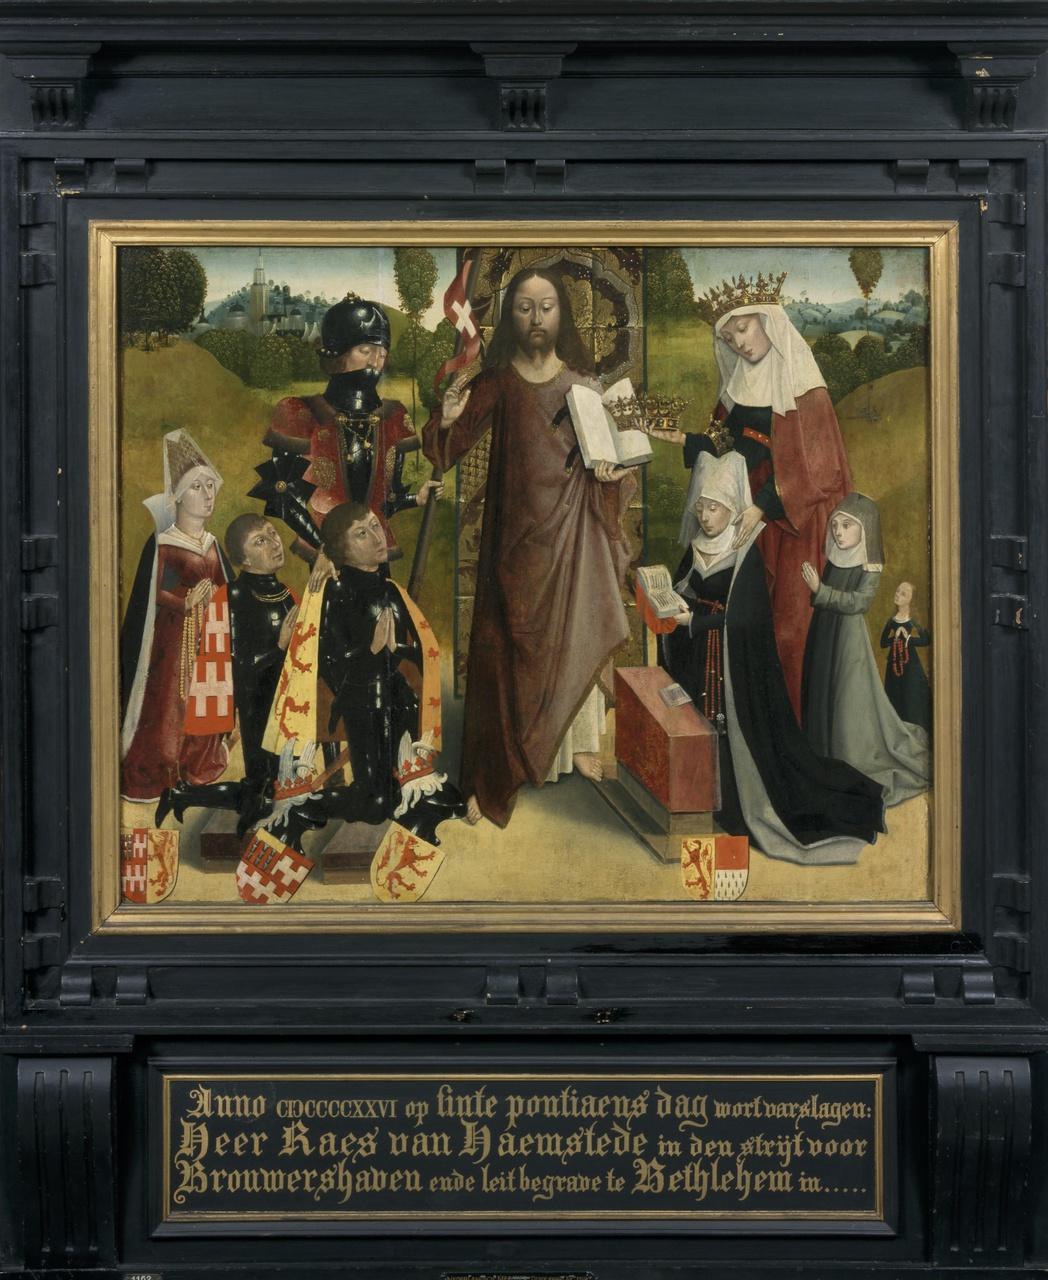 Memorietafel van Heer Raas van Haamstede